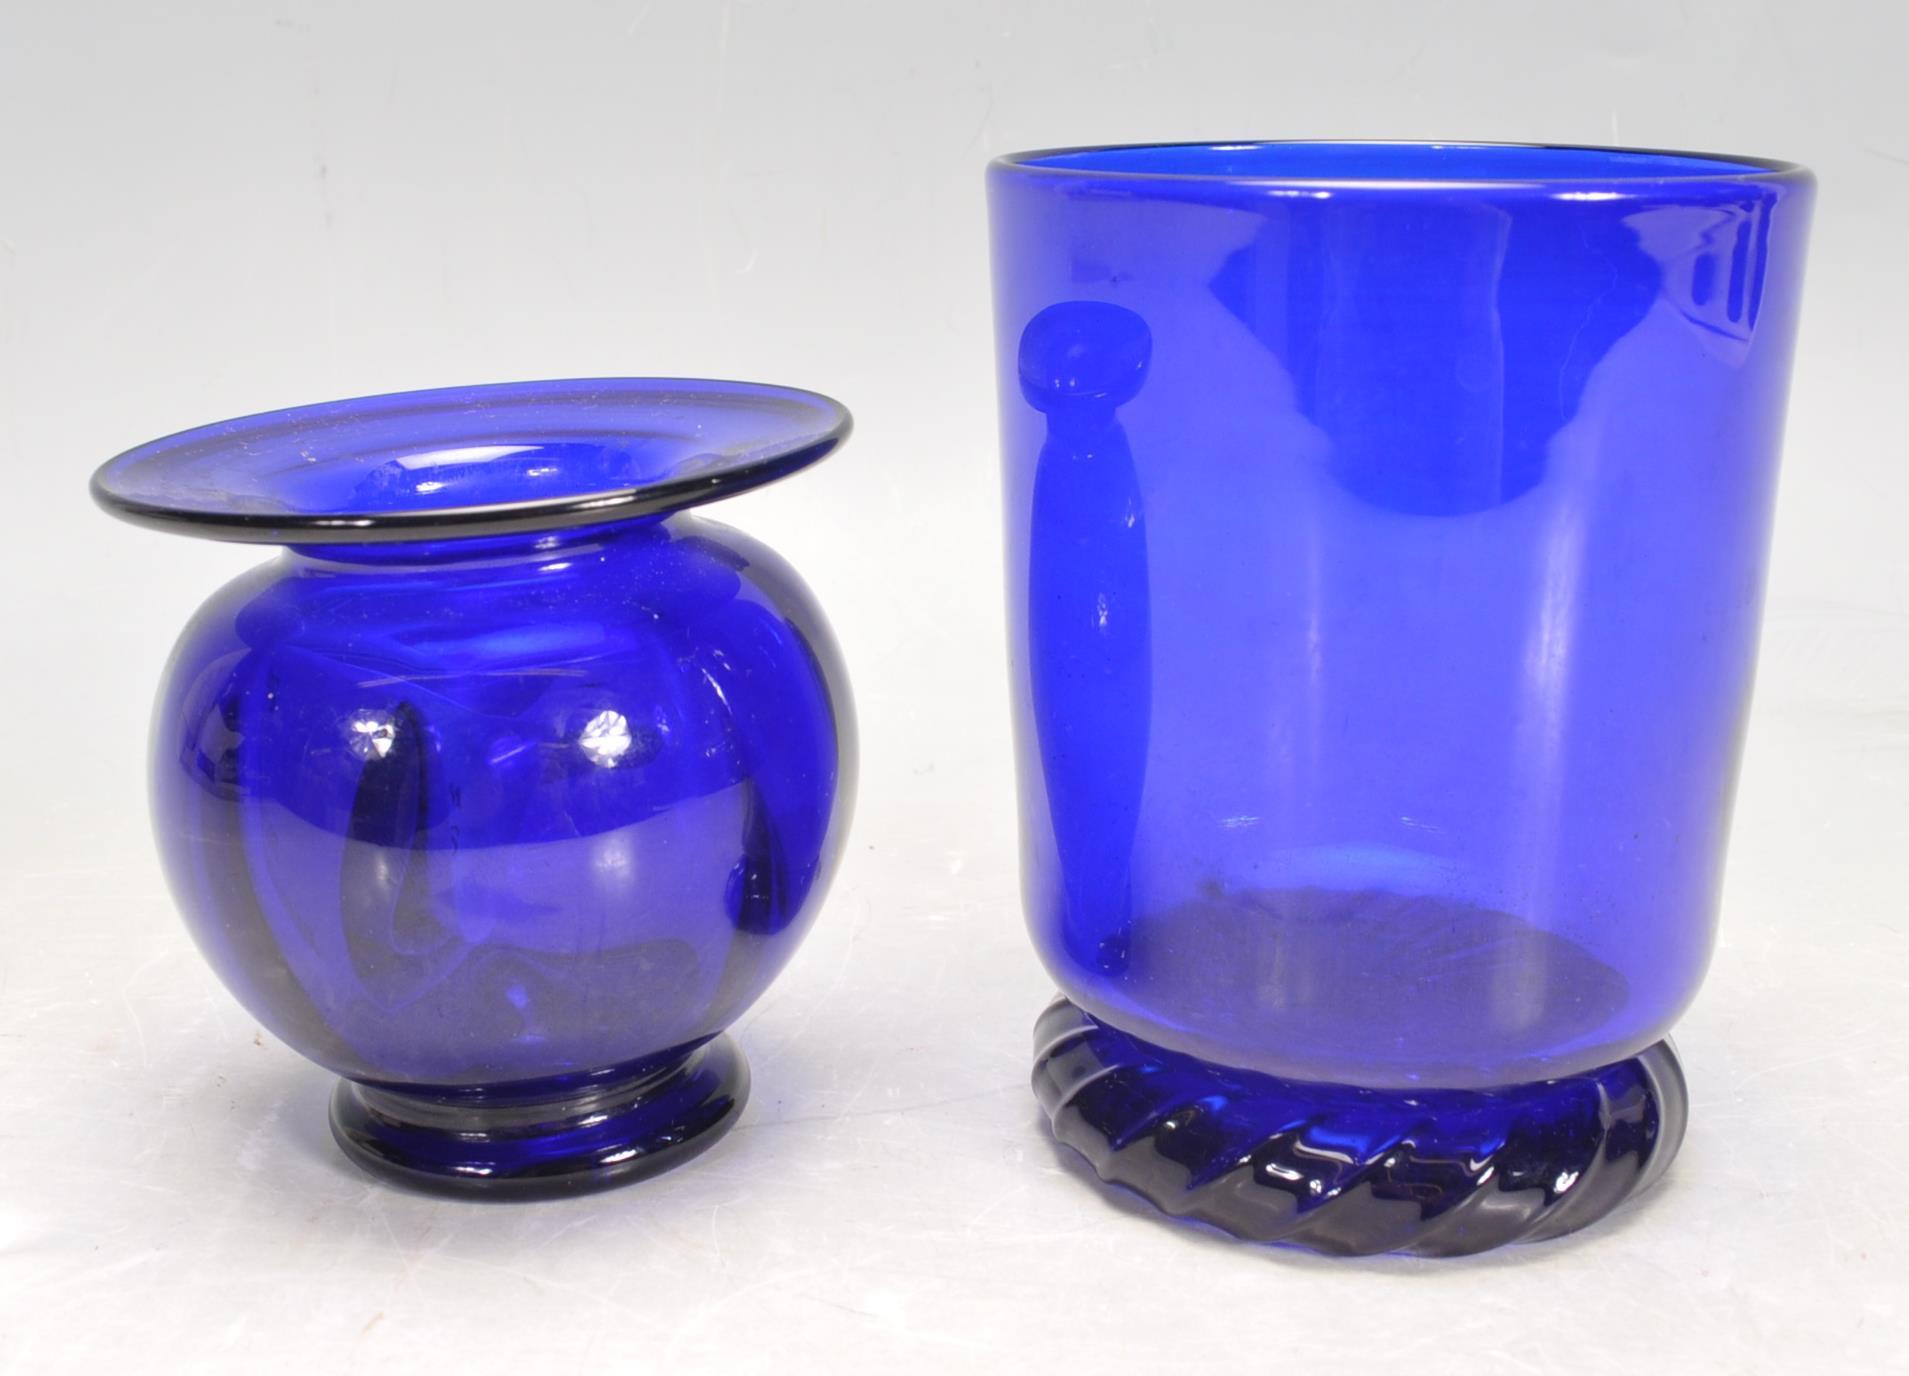 BRISTOL BLUE GLASS ORNAMENTS - Image 23 of 34